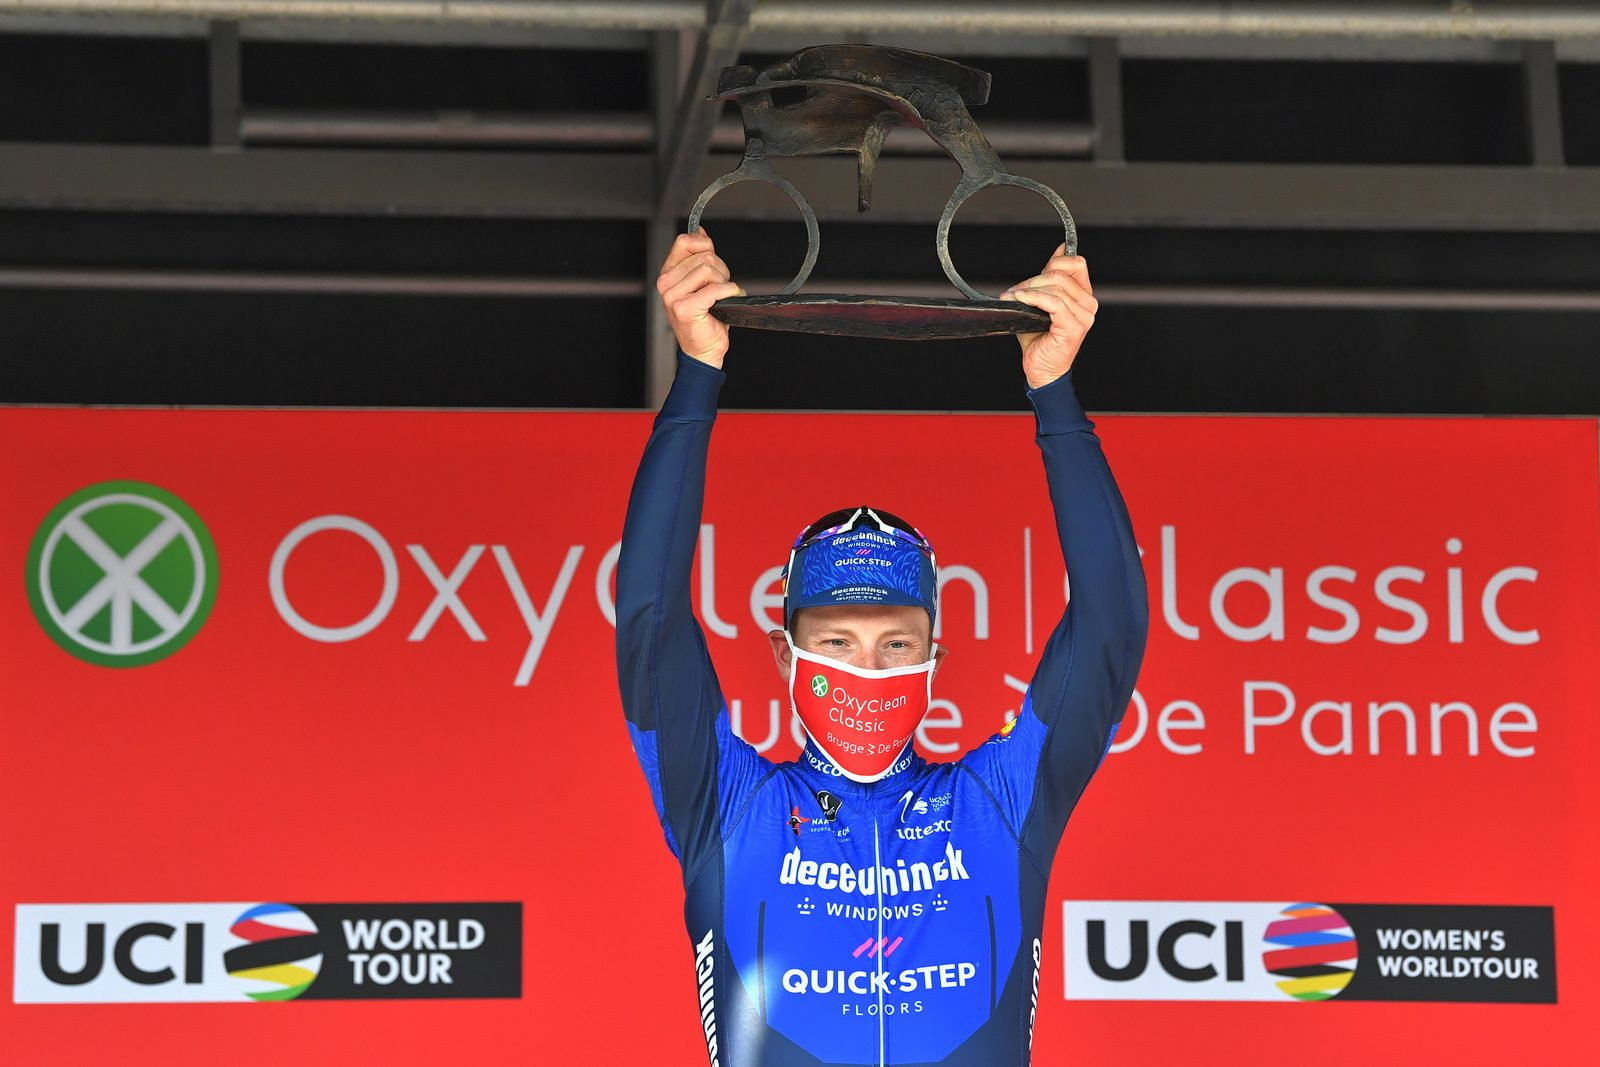 Сэм Беннетт выиграл велогонку Oxyclean Classic Brugge-De Panne